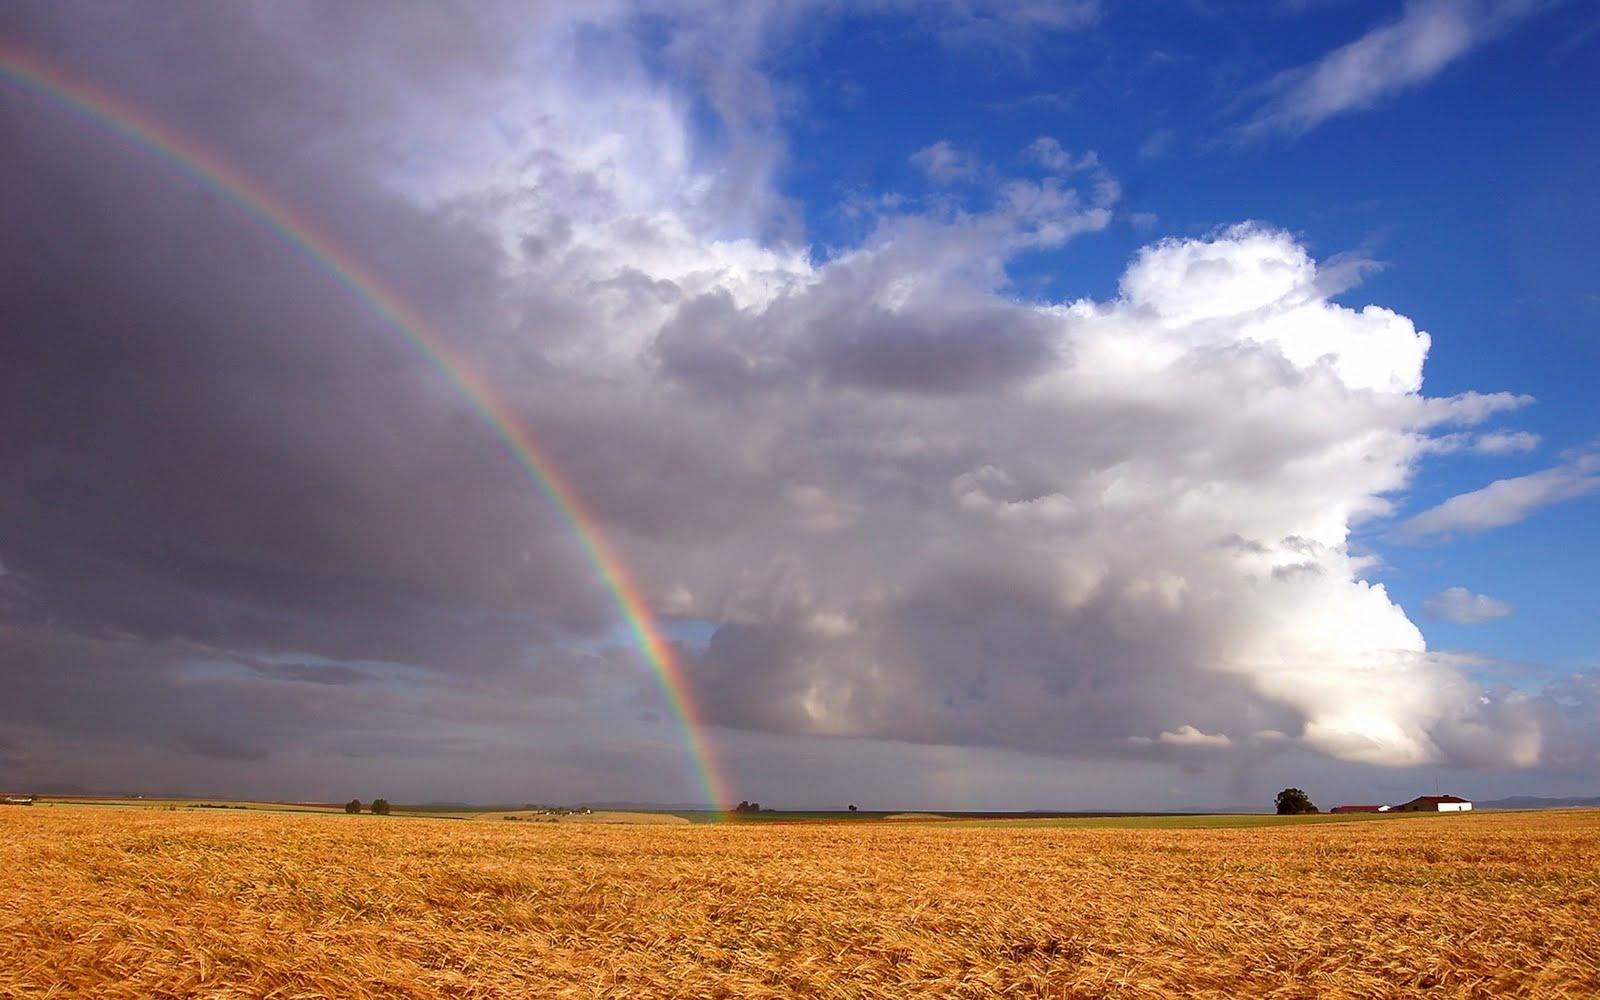 http://1.bp.blogspot.com/_2IU2Nt4rD1k/TDorD2cFxRI/AAAAAAAAB3M/t2THtAPVs1k/s1600/rainbow_wallpaper.jpg